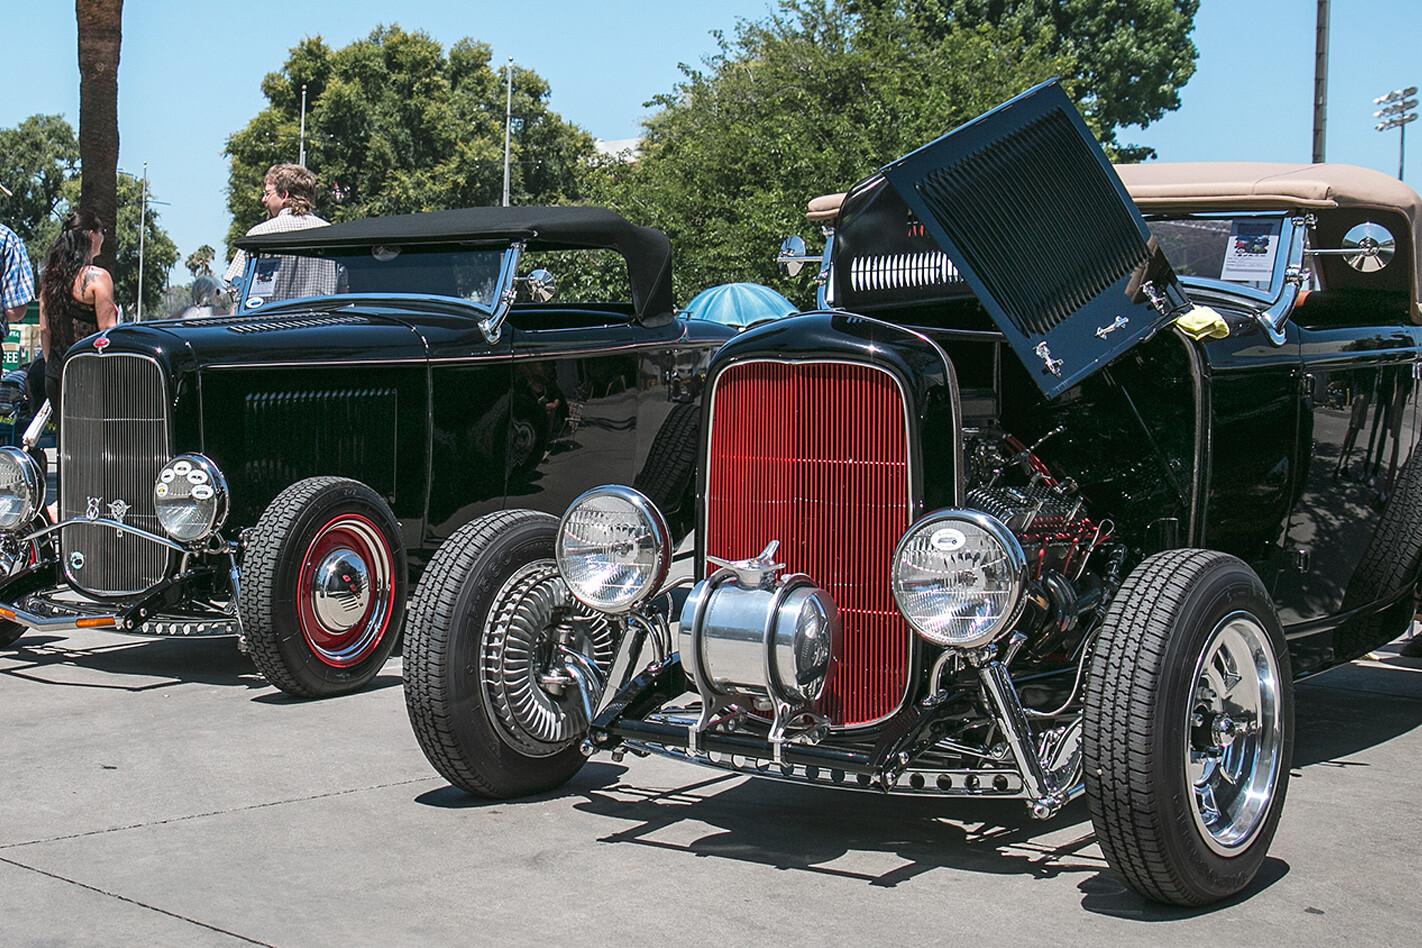 LA-roadster -show -4